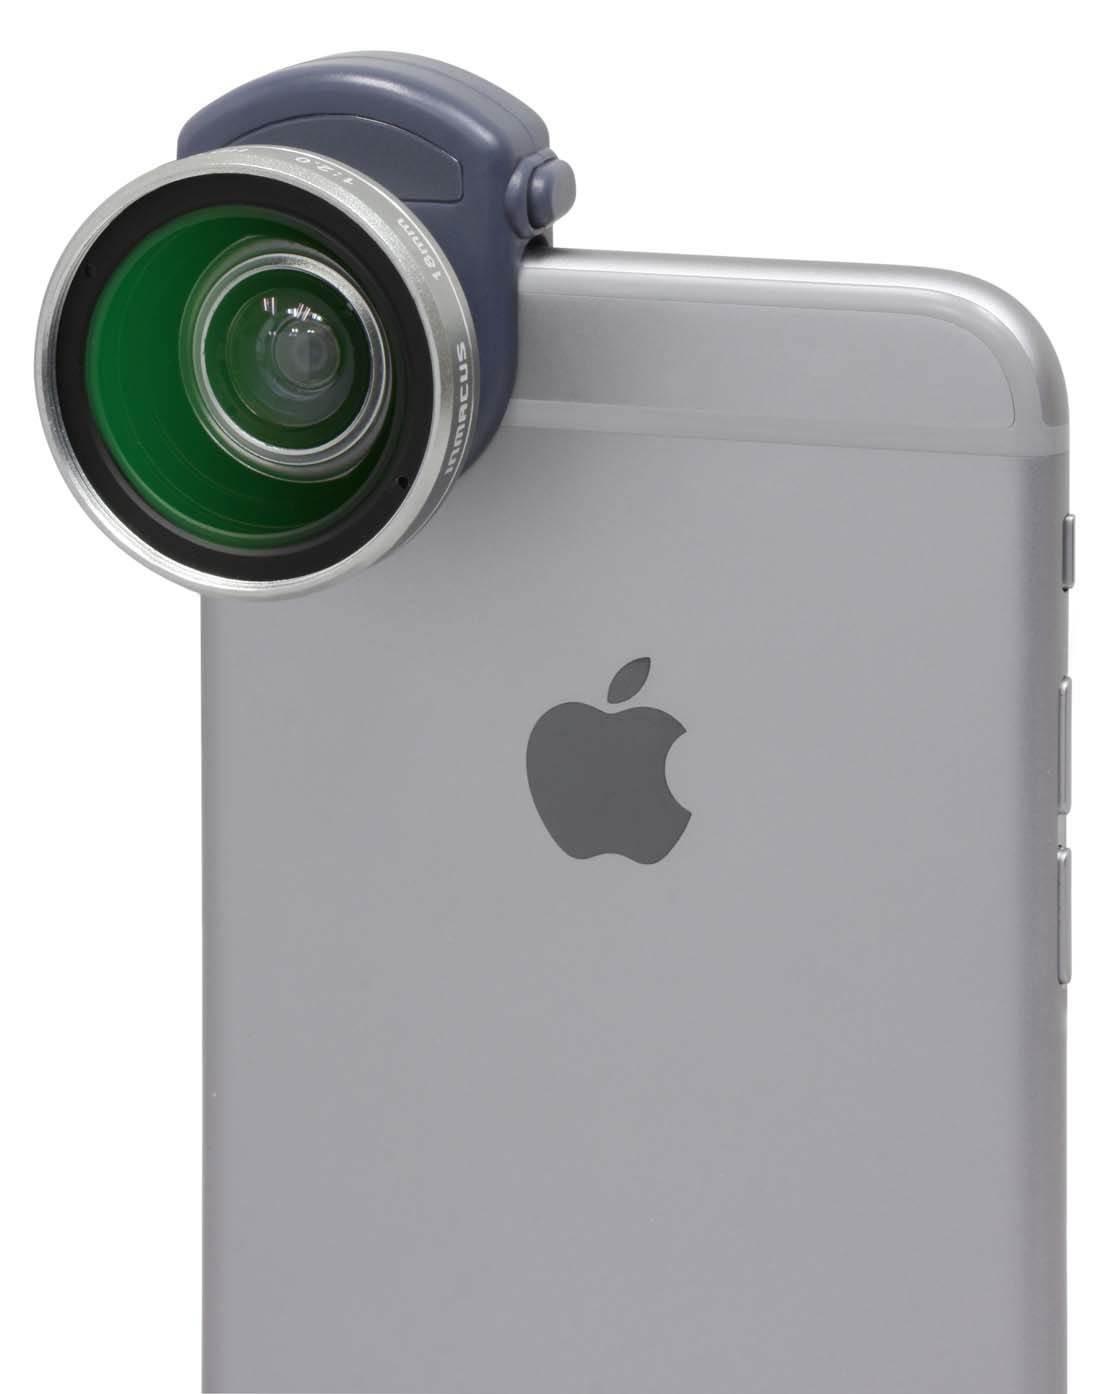 Inmacus iPhone Lenses 9 no script